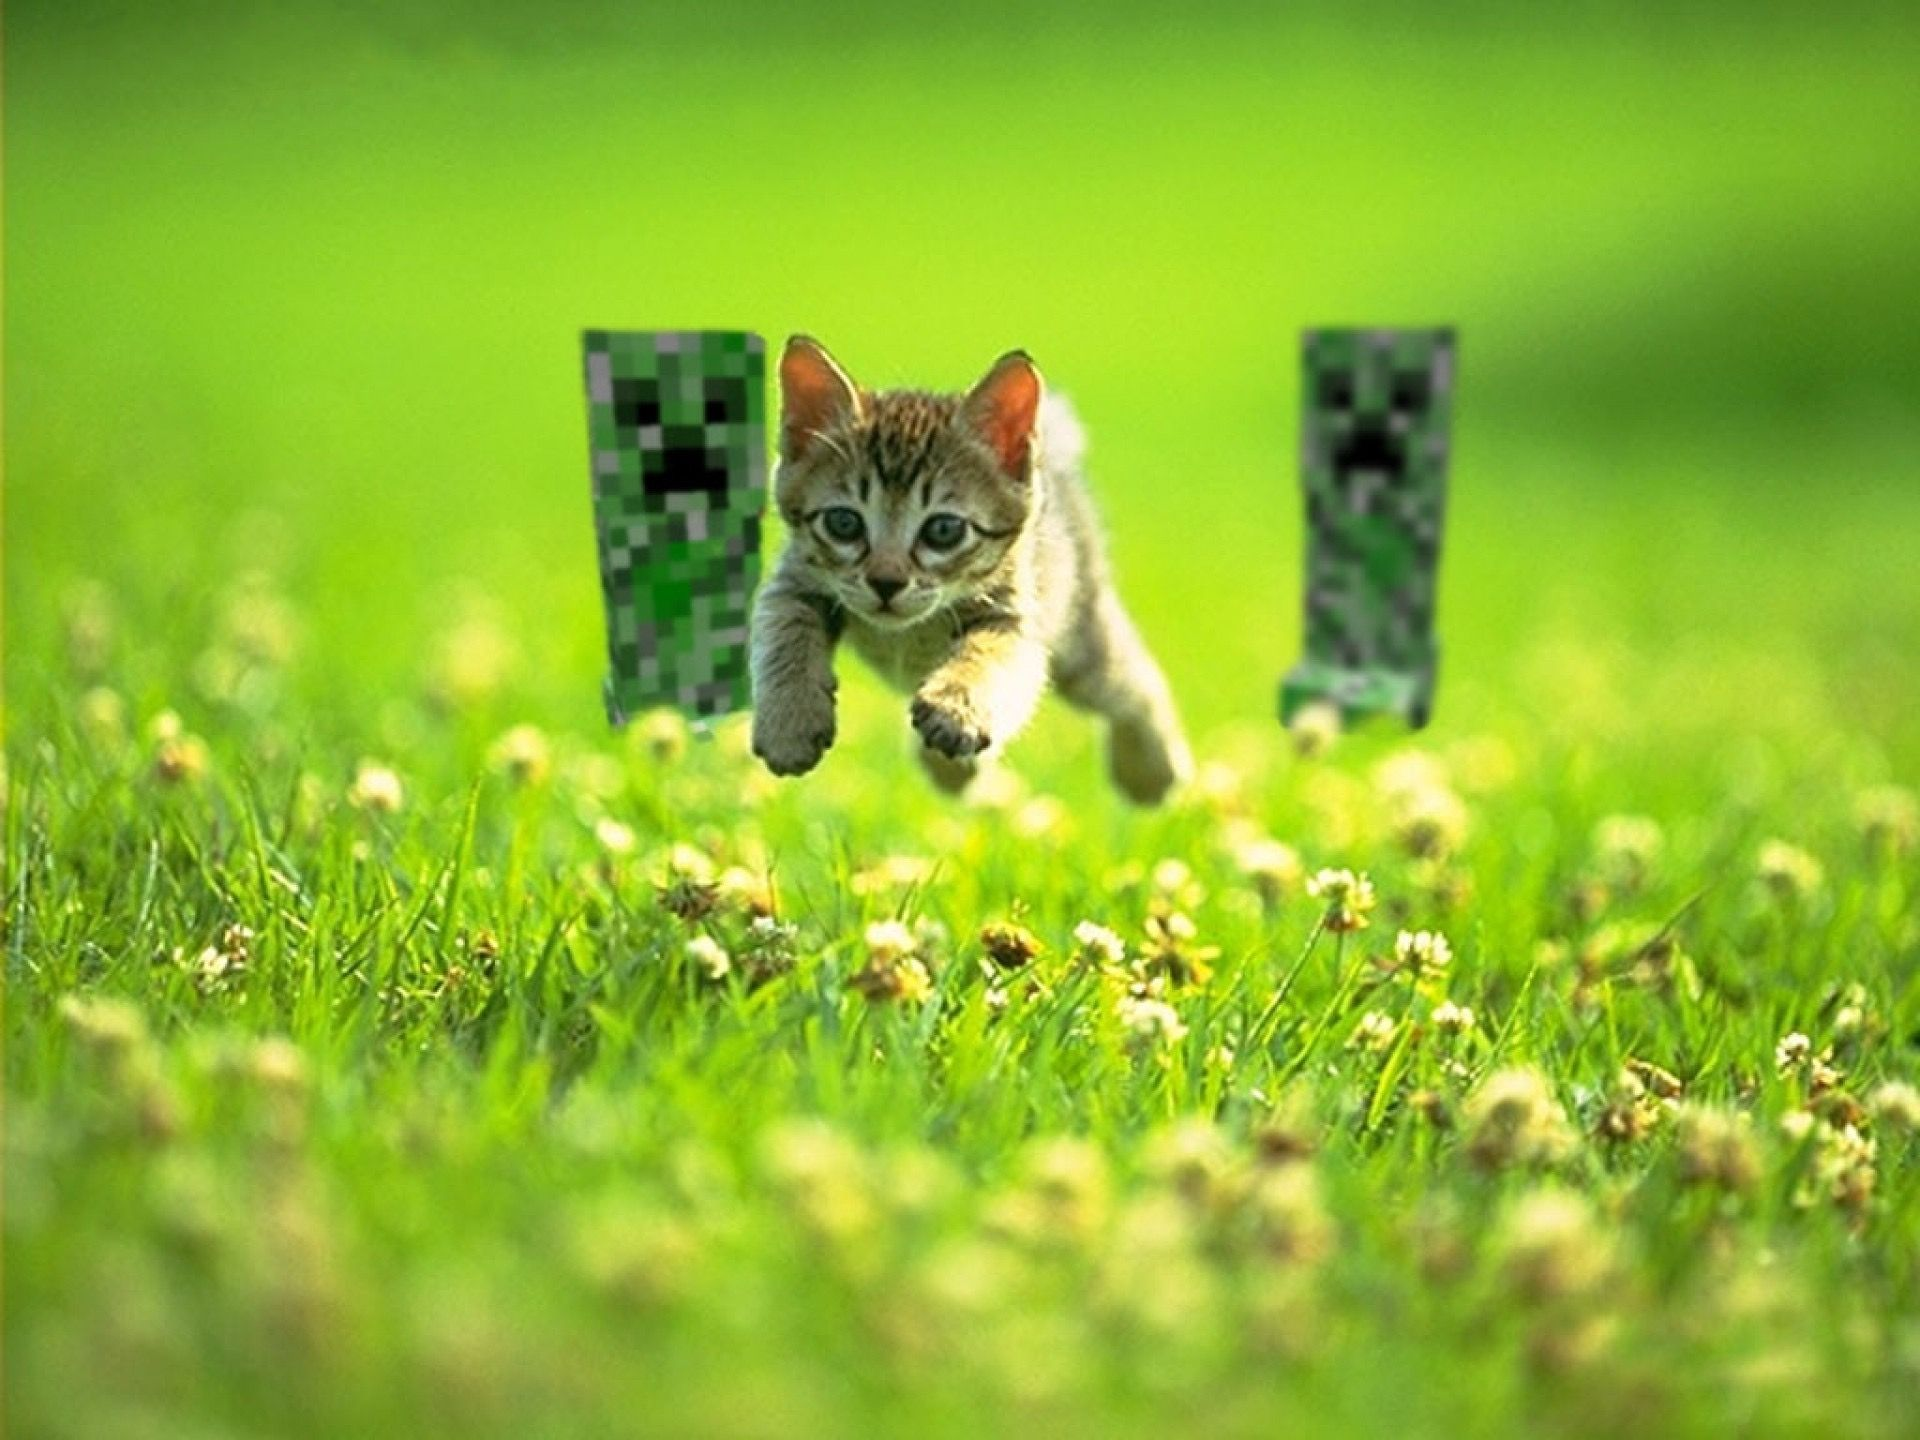 Pin By Marley Cochran On Minecraft Cute Animals Kittens Kittens Cutest